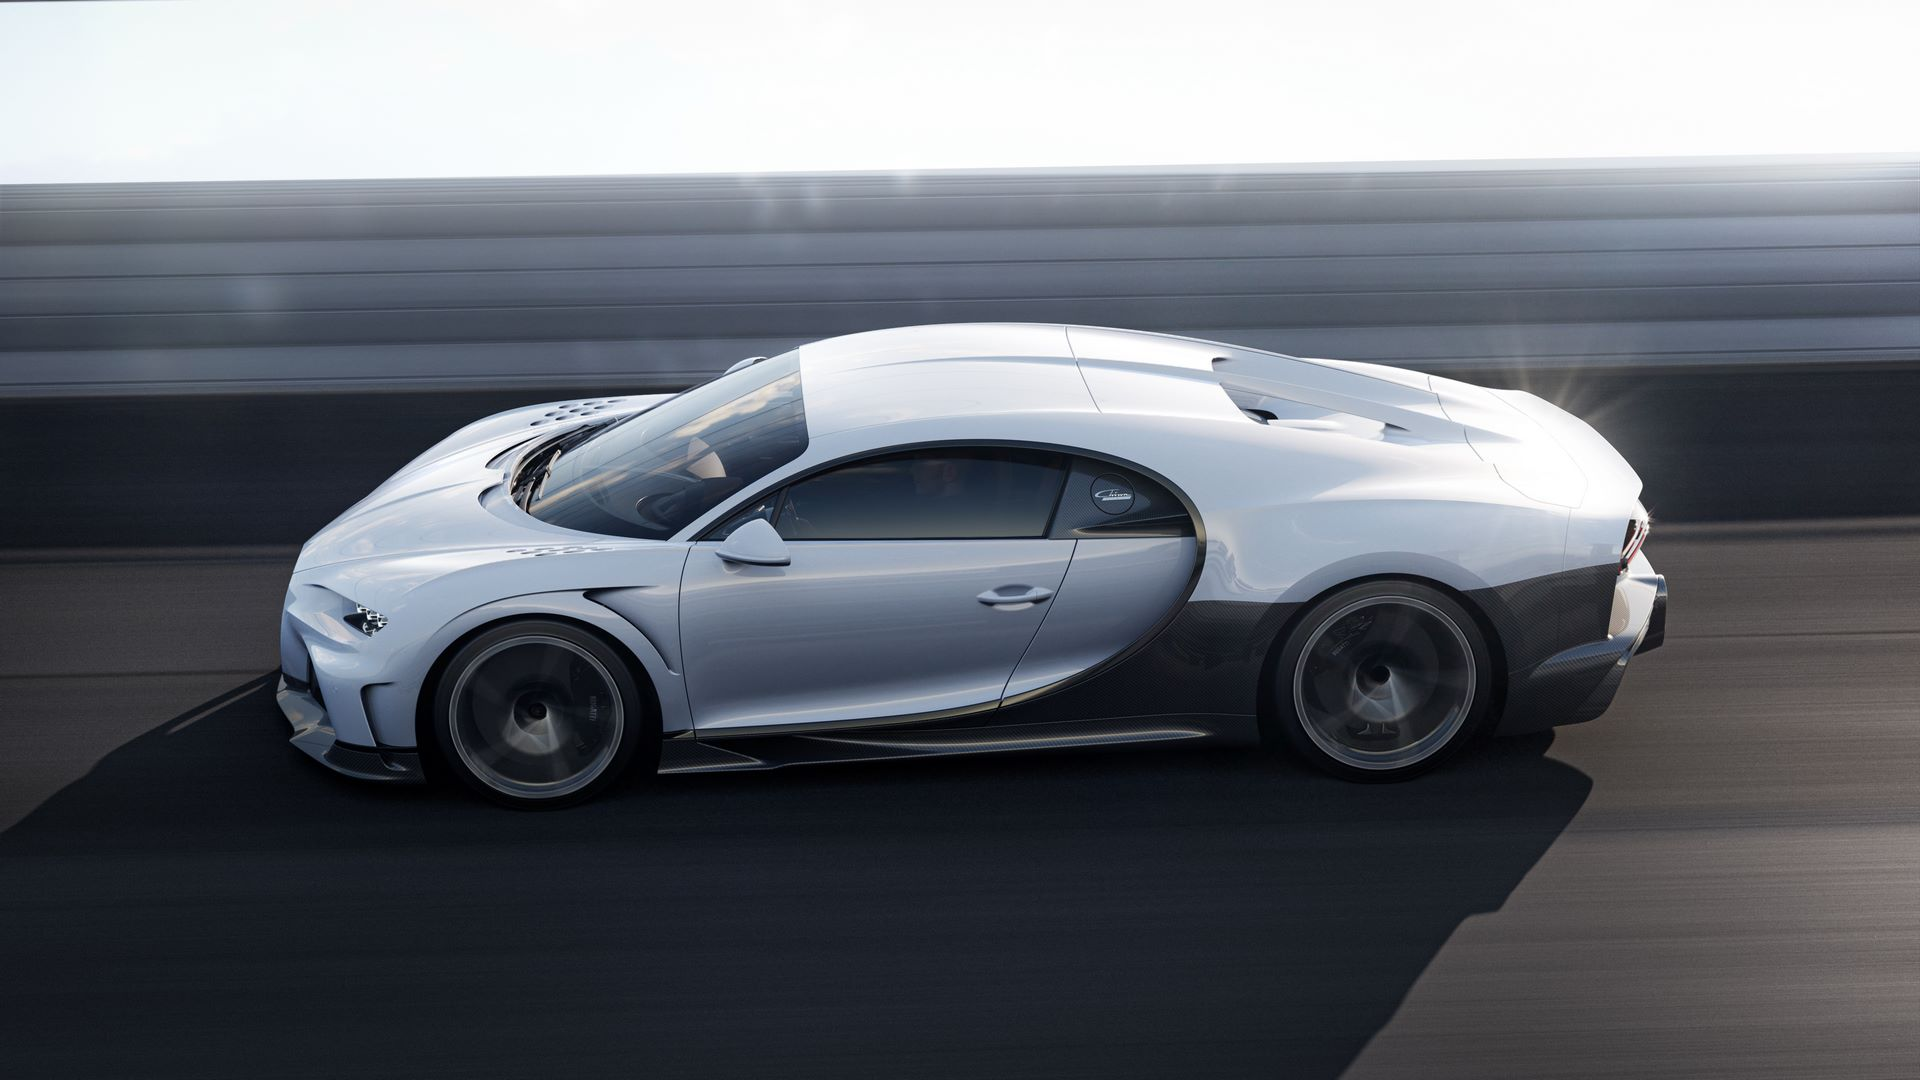 02_05_bugatti_chiron_super_sport_high_speed_side